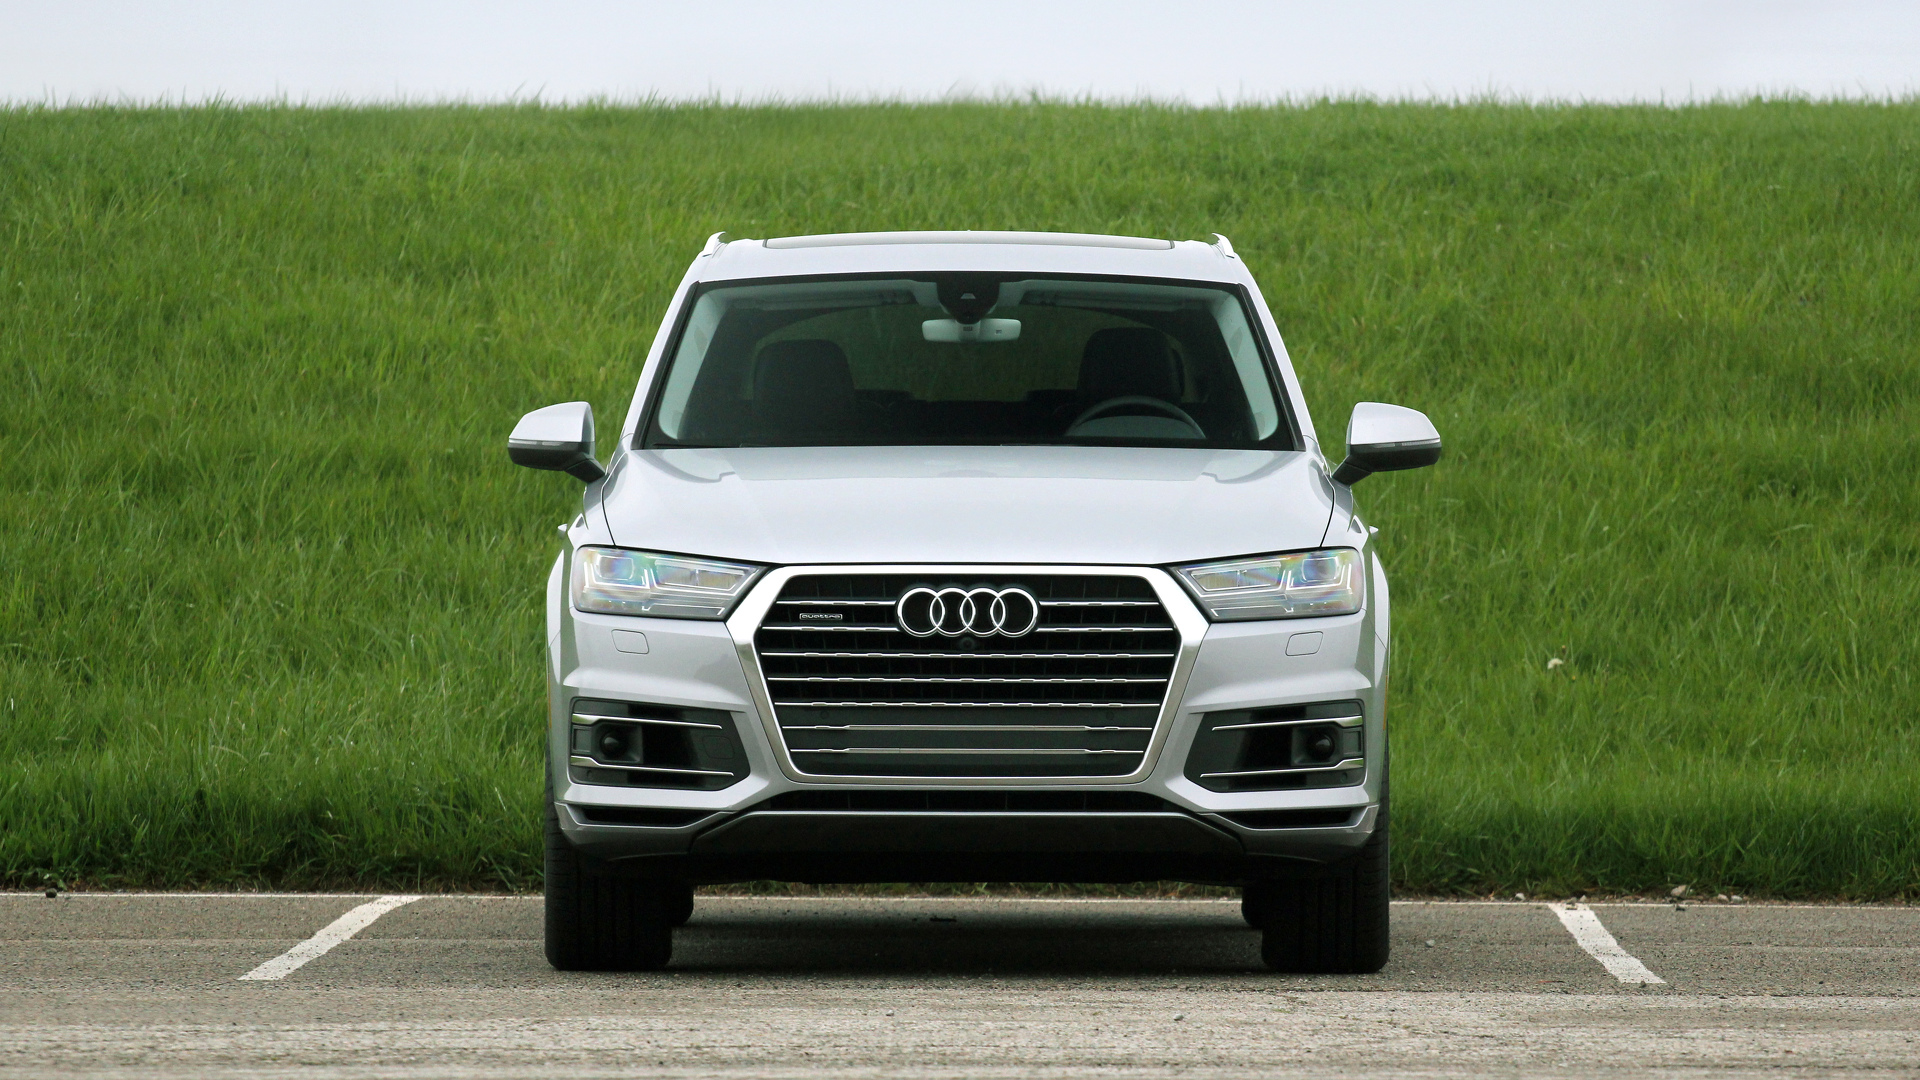 Review: 2017 Audi Q7